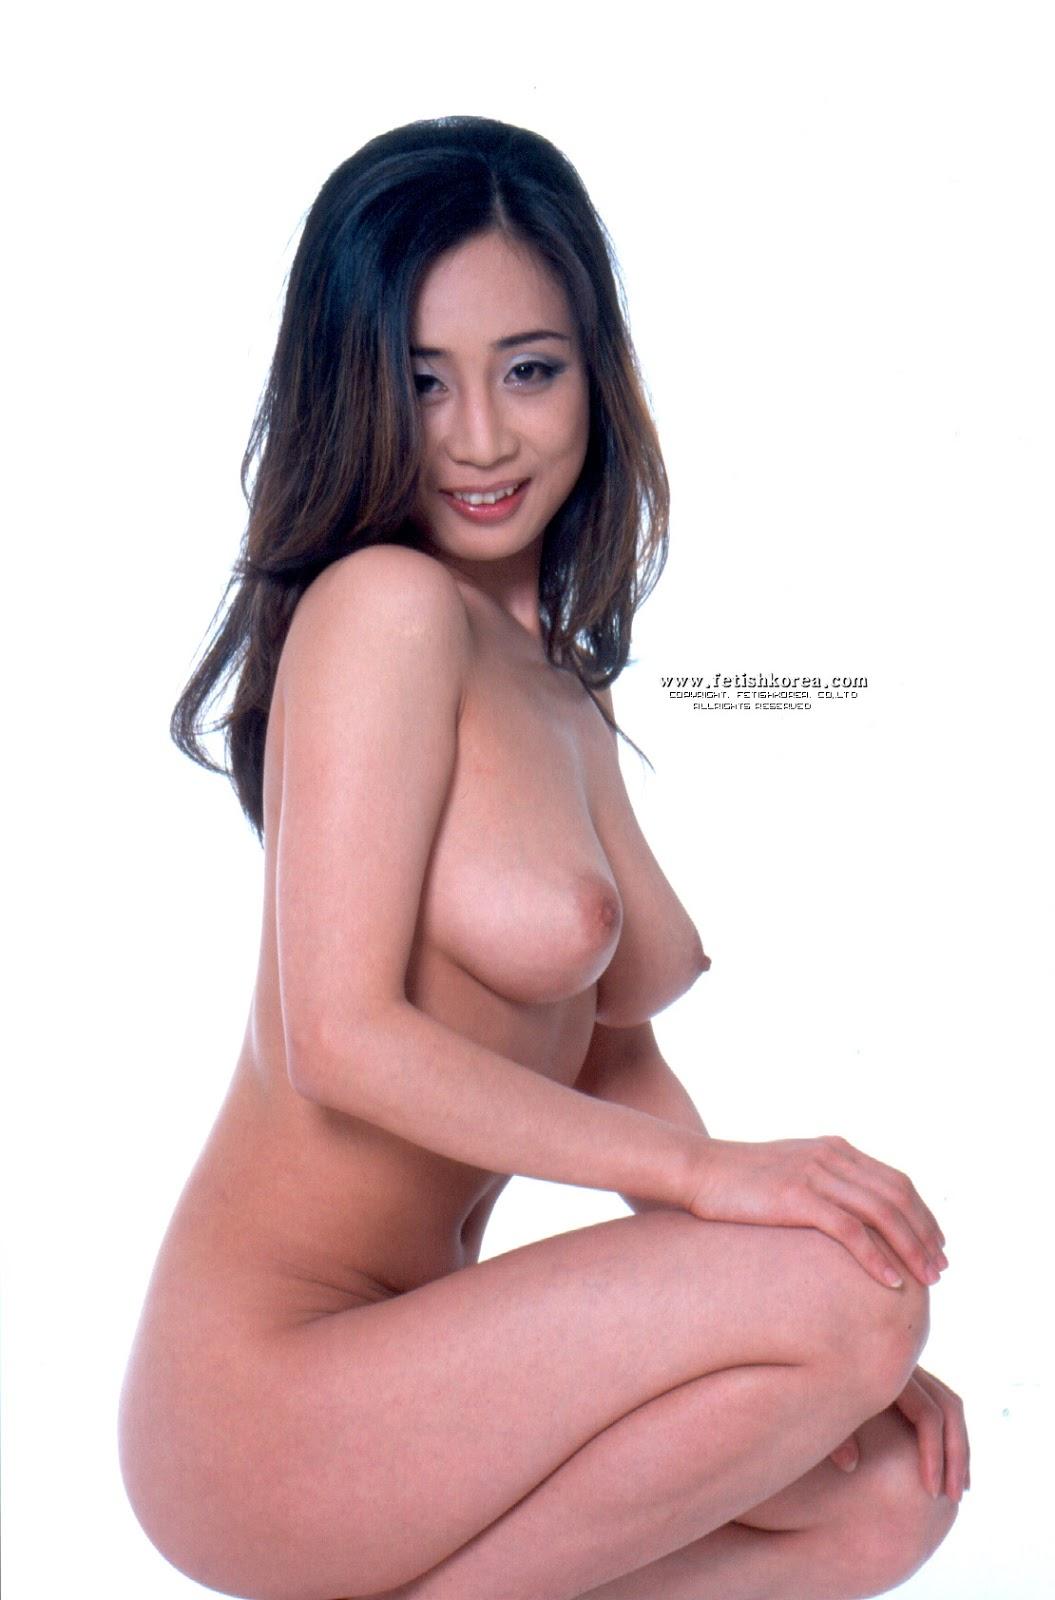 Fetishkorea.MD069.rar.fk_rumio_031 Fetishkorea.MD069.rar fetishkorea 05140